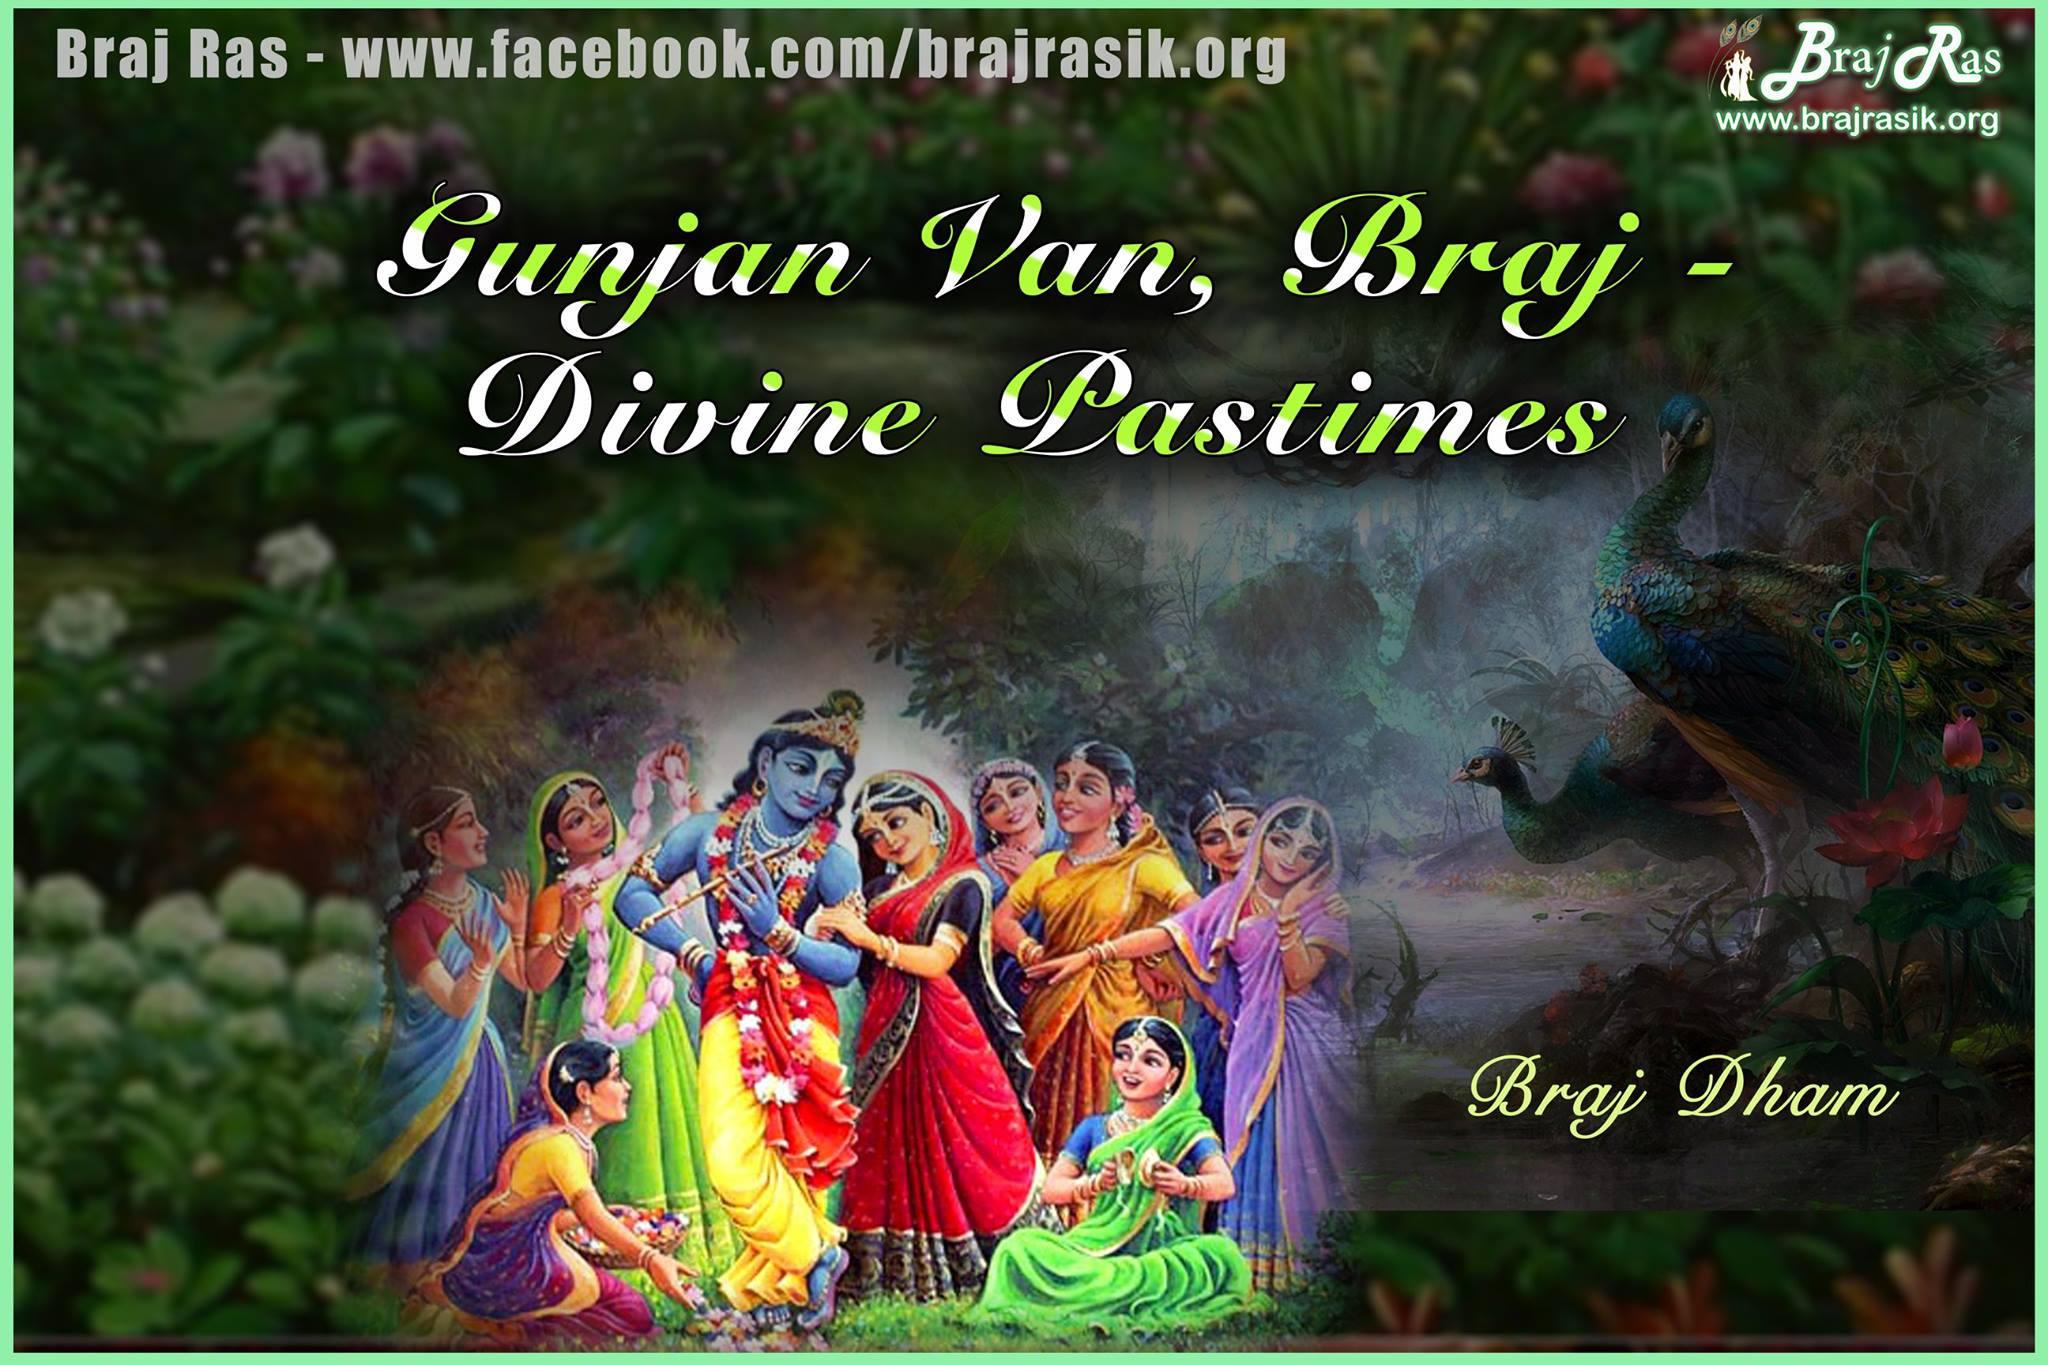 Gunjana Vana, Braj - Divine Pastimes